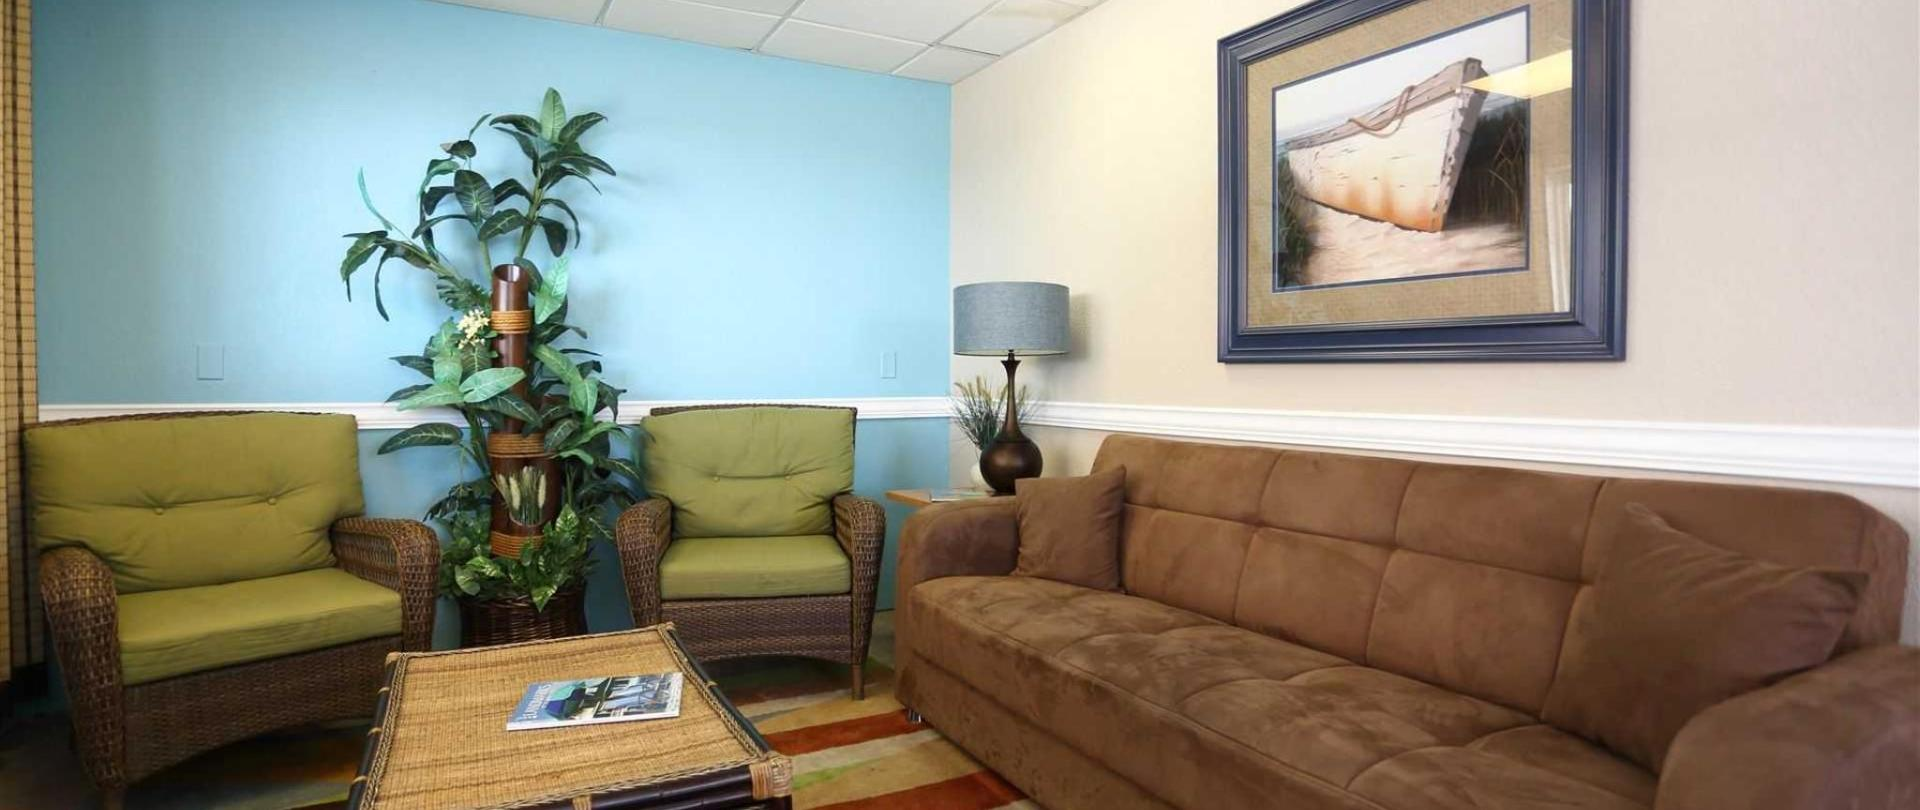 Days Inn Suites Wildwood